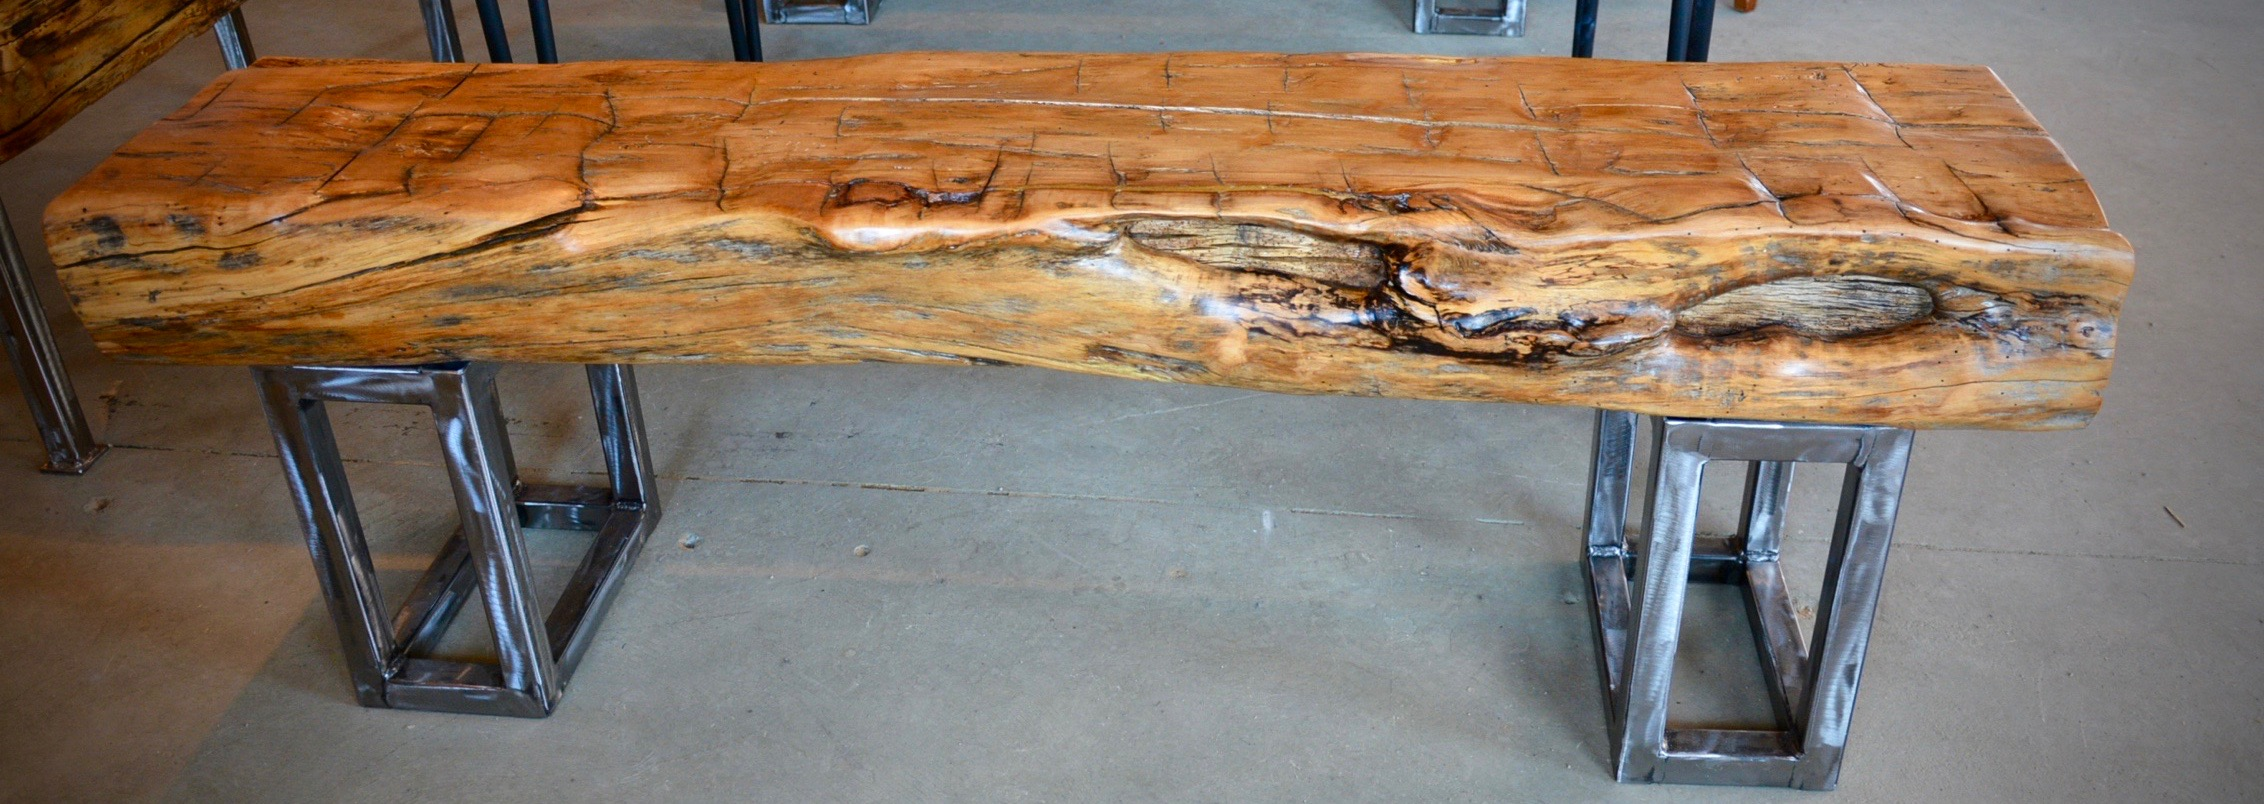 Fine Barn Beam Bench Long2 Arthaus150 Ibusinesslaw Wood Chair Design Ideas Ibusinesslaworg